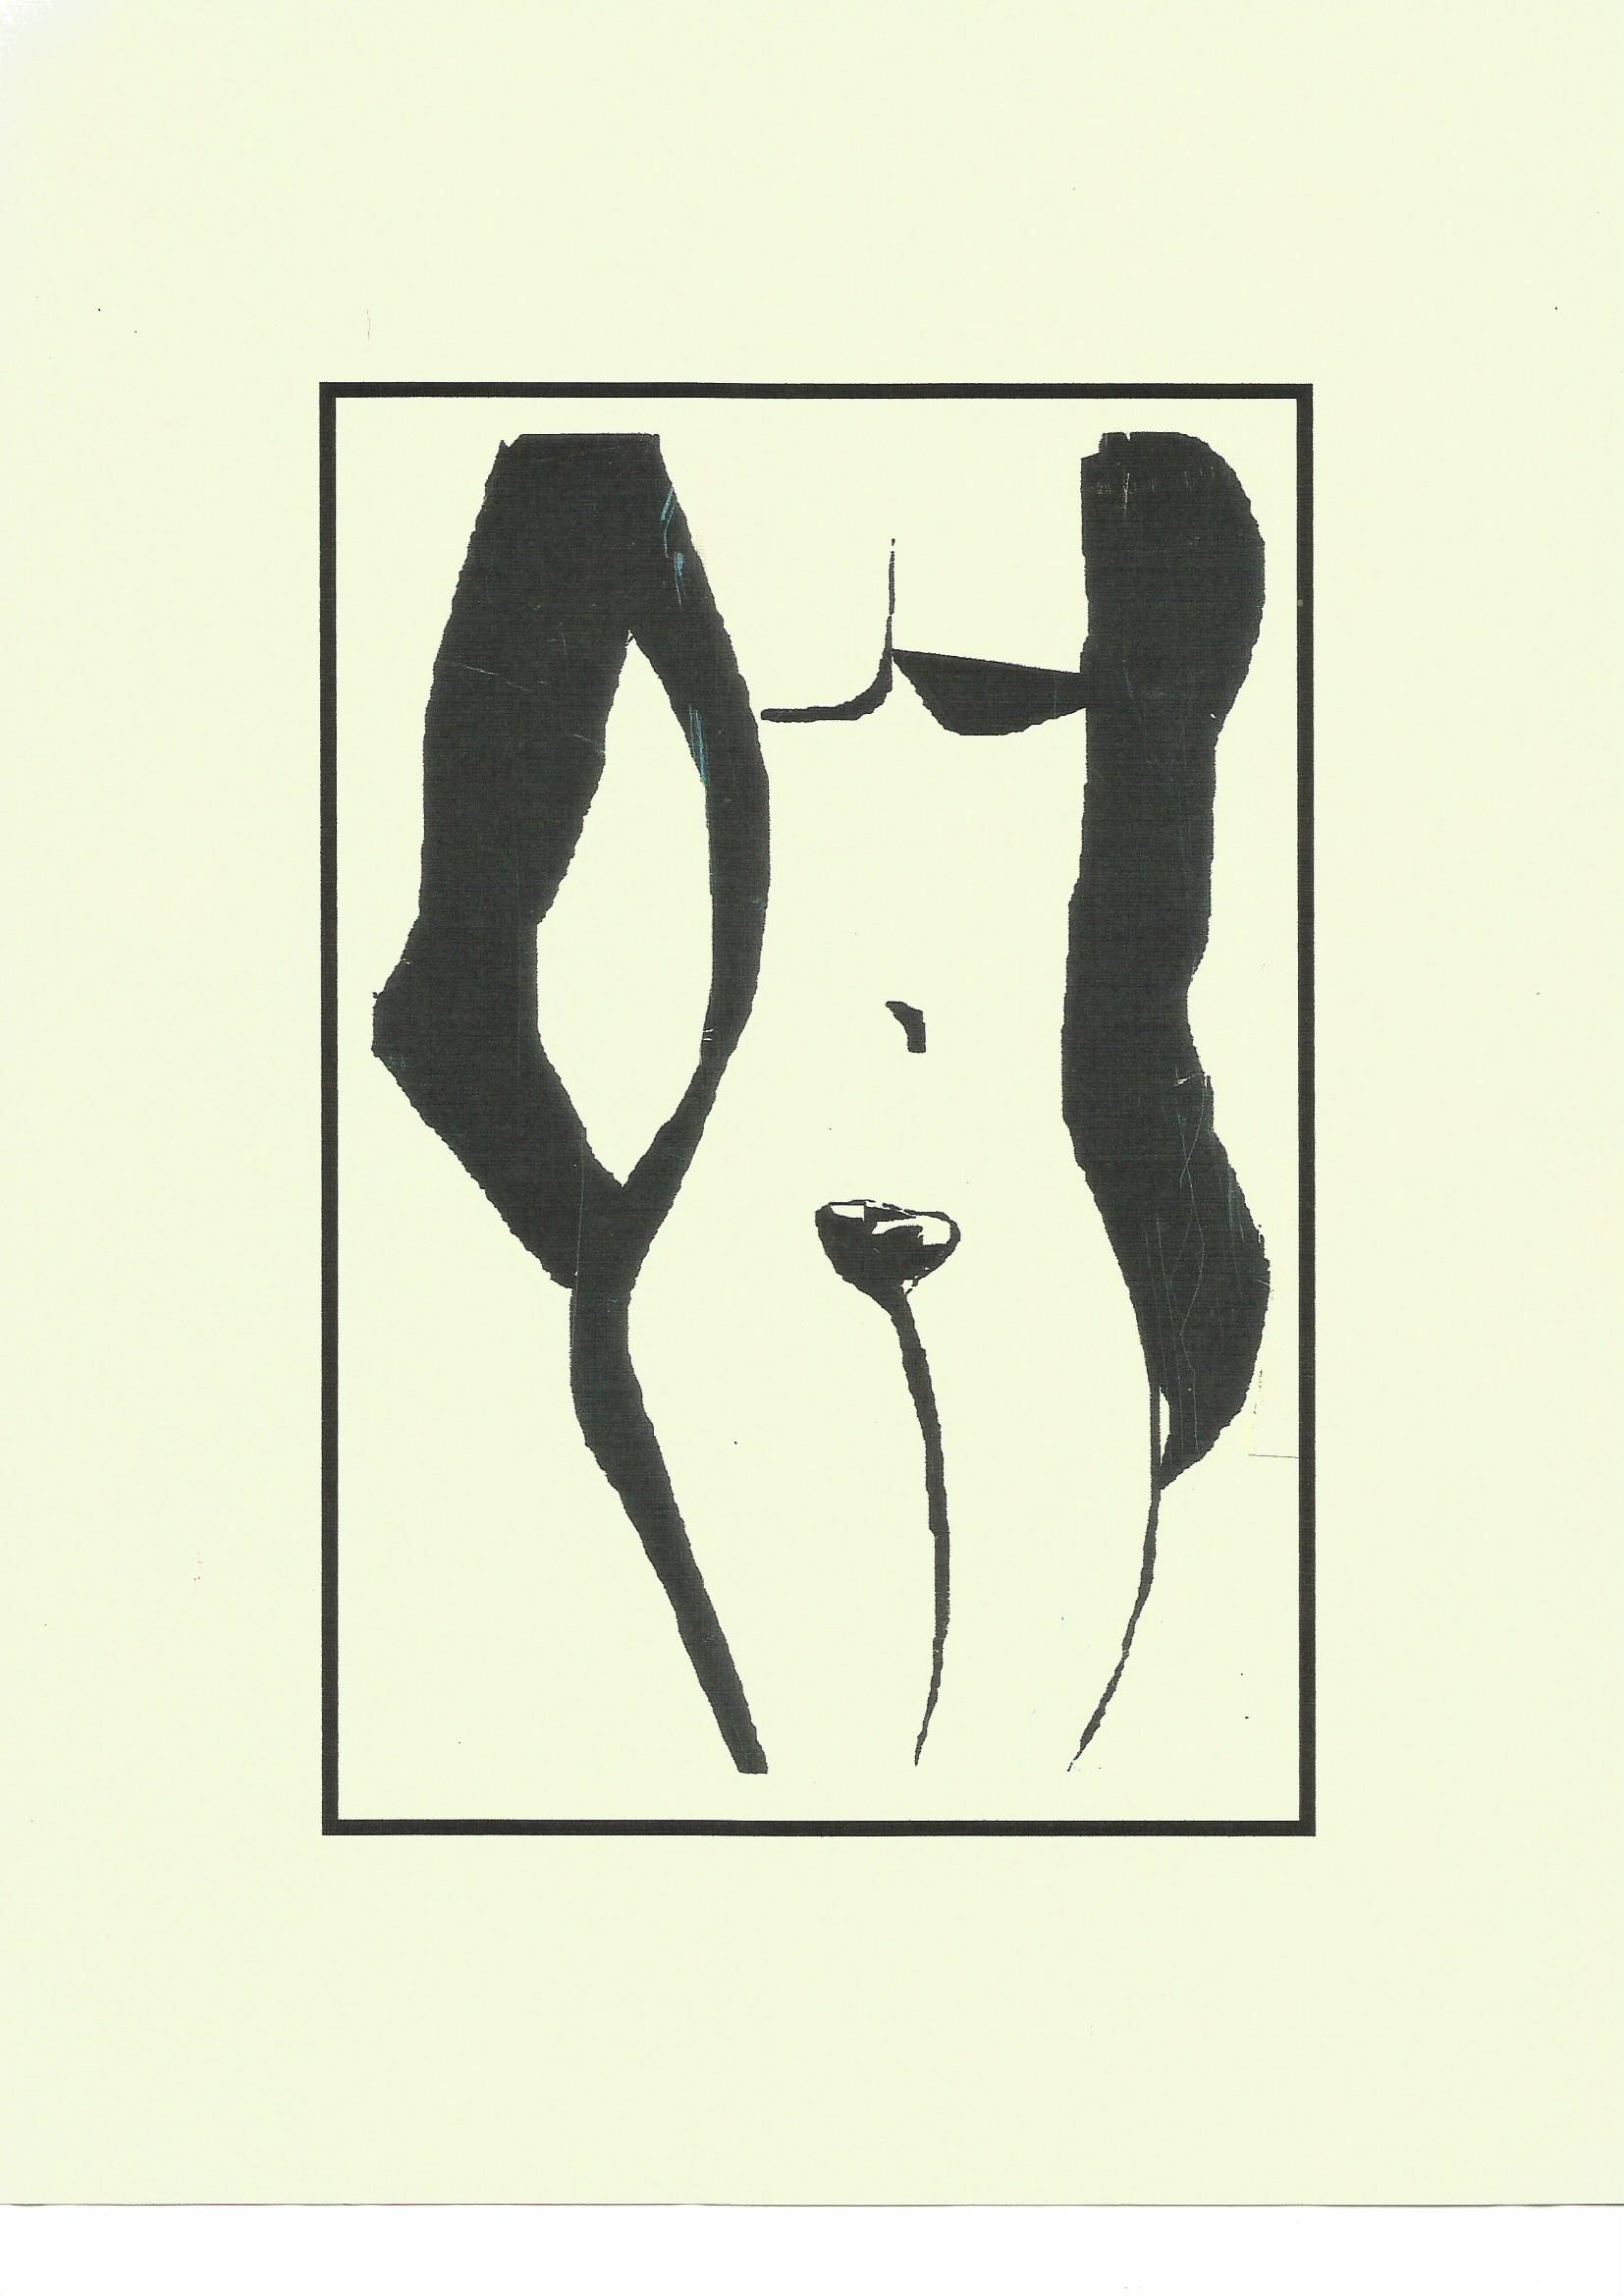 El desnudo (2013) - Yolanda González Holmann